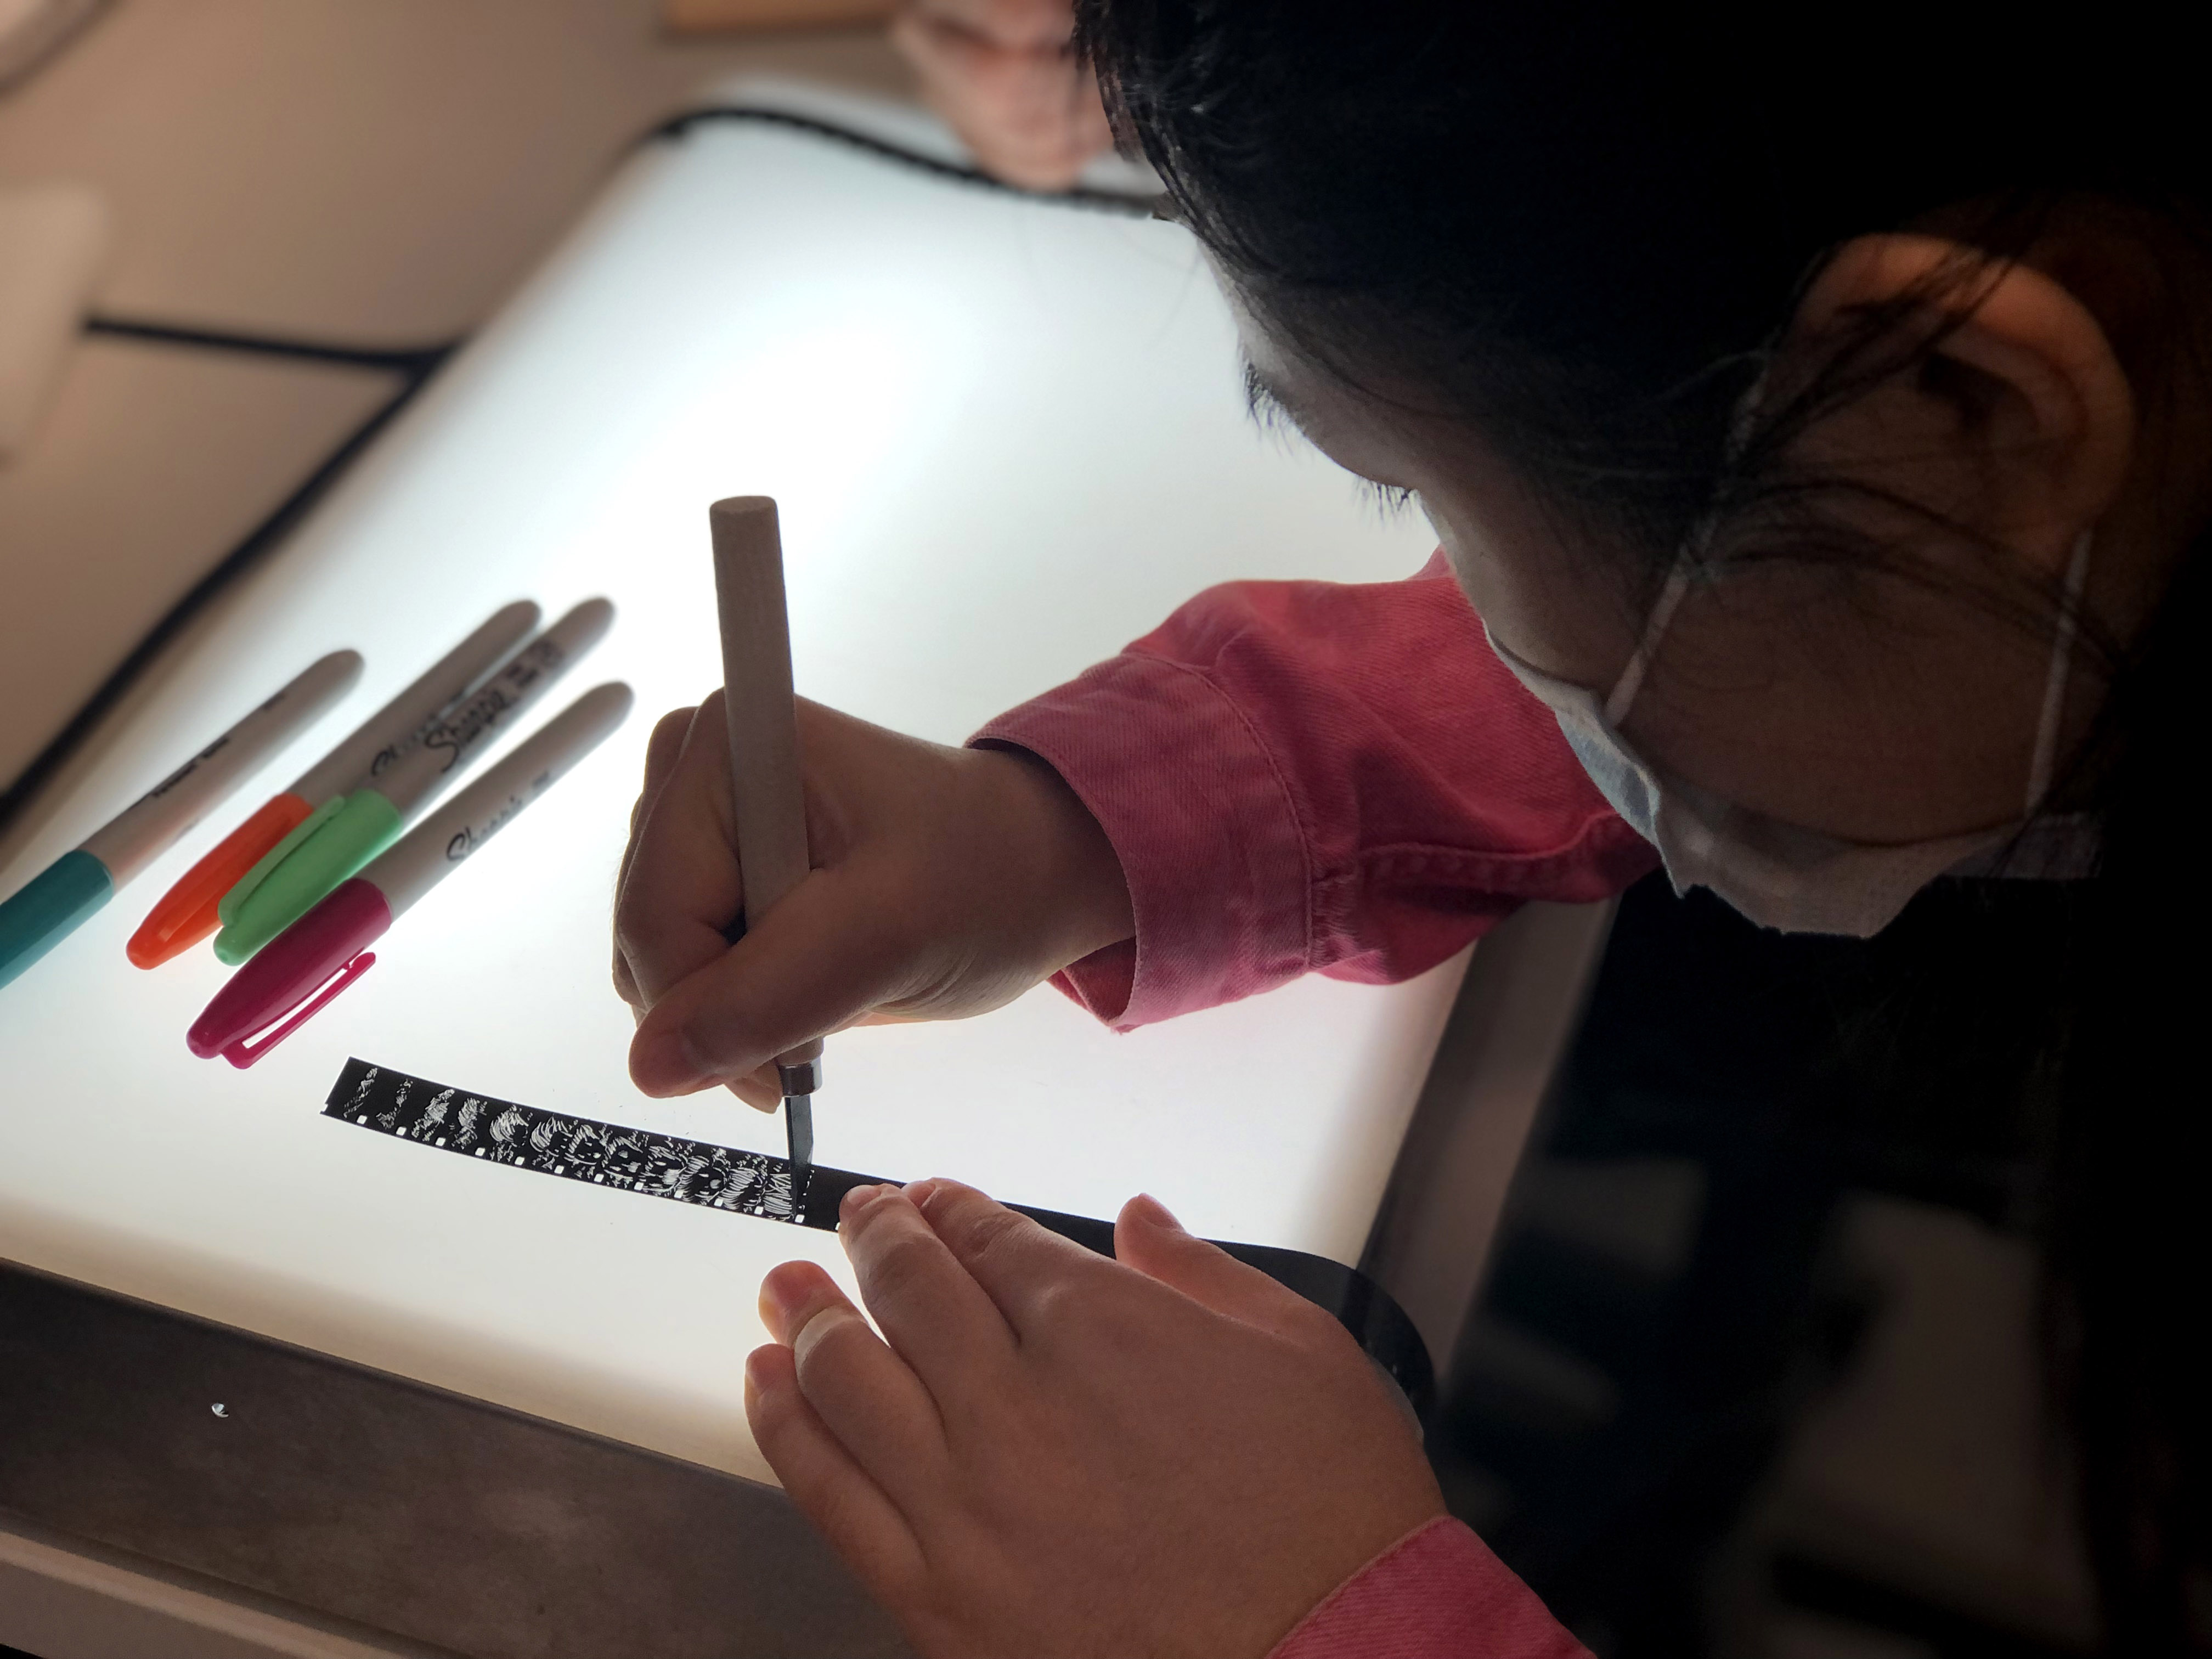 Female student draws on film strip on lightbox